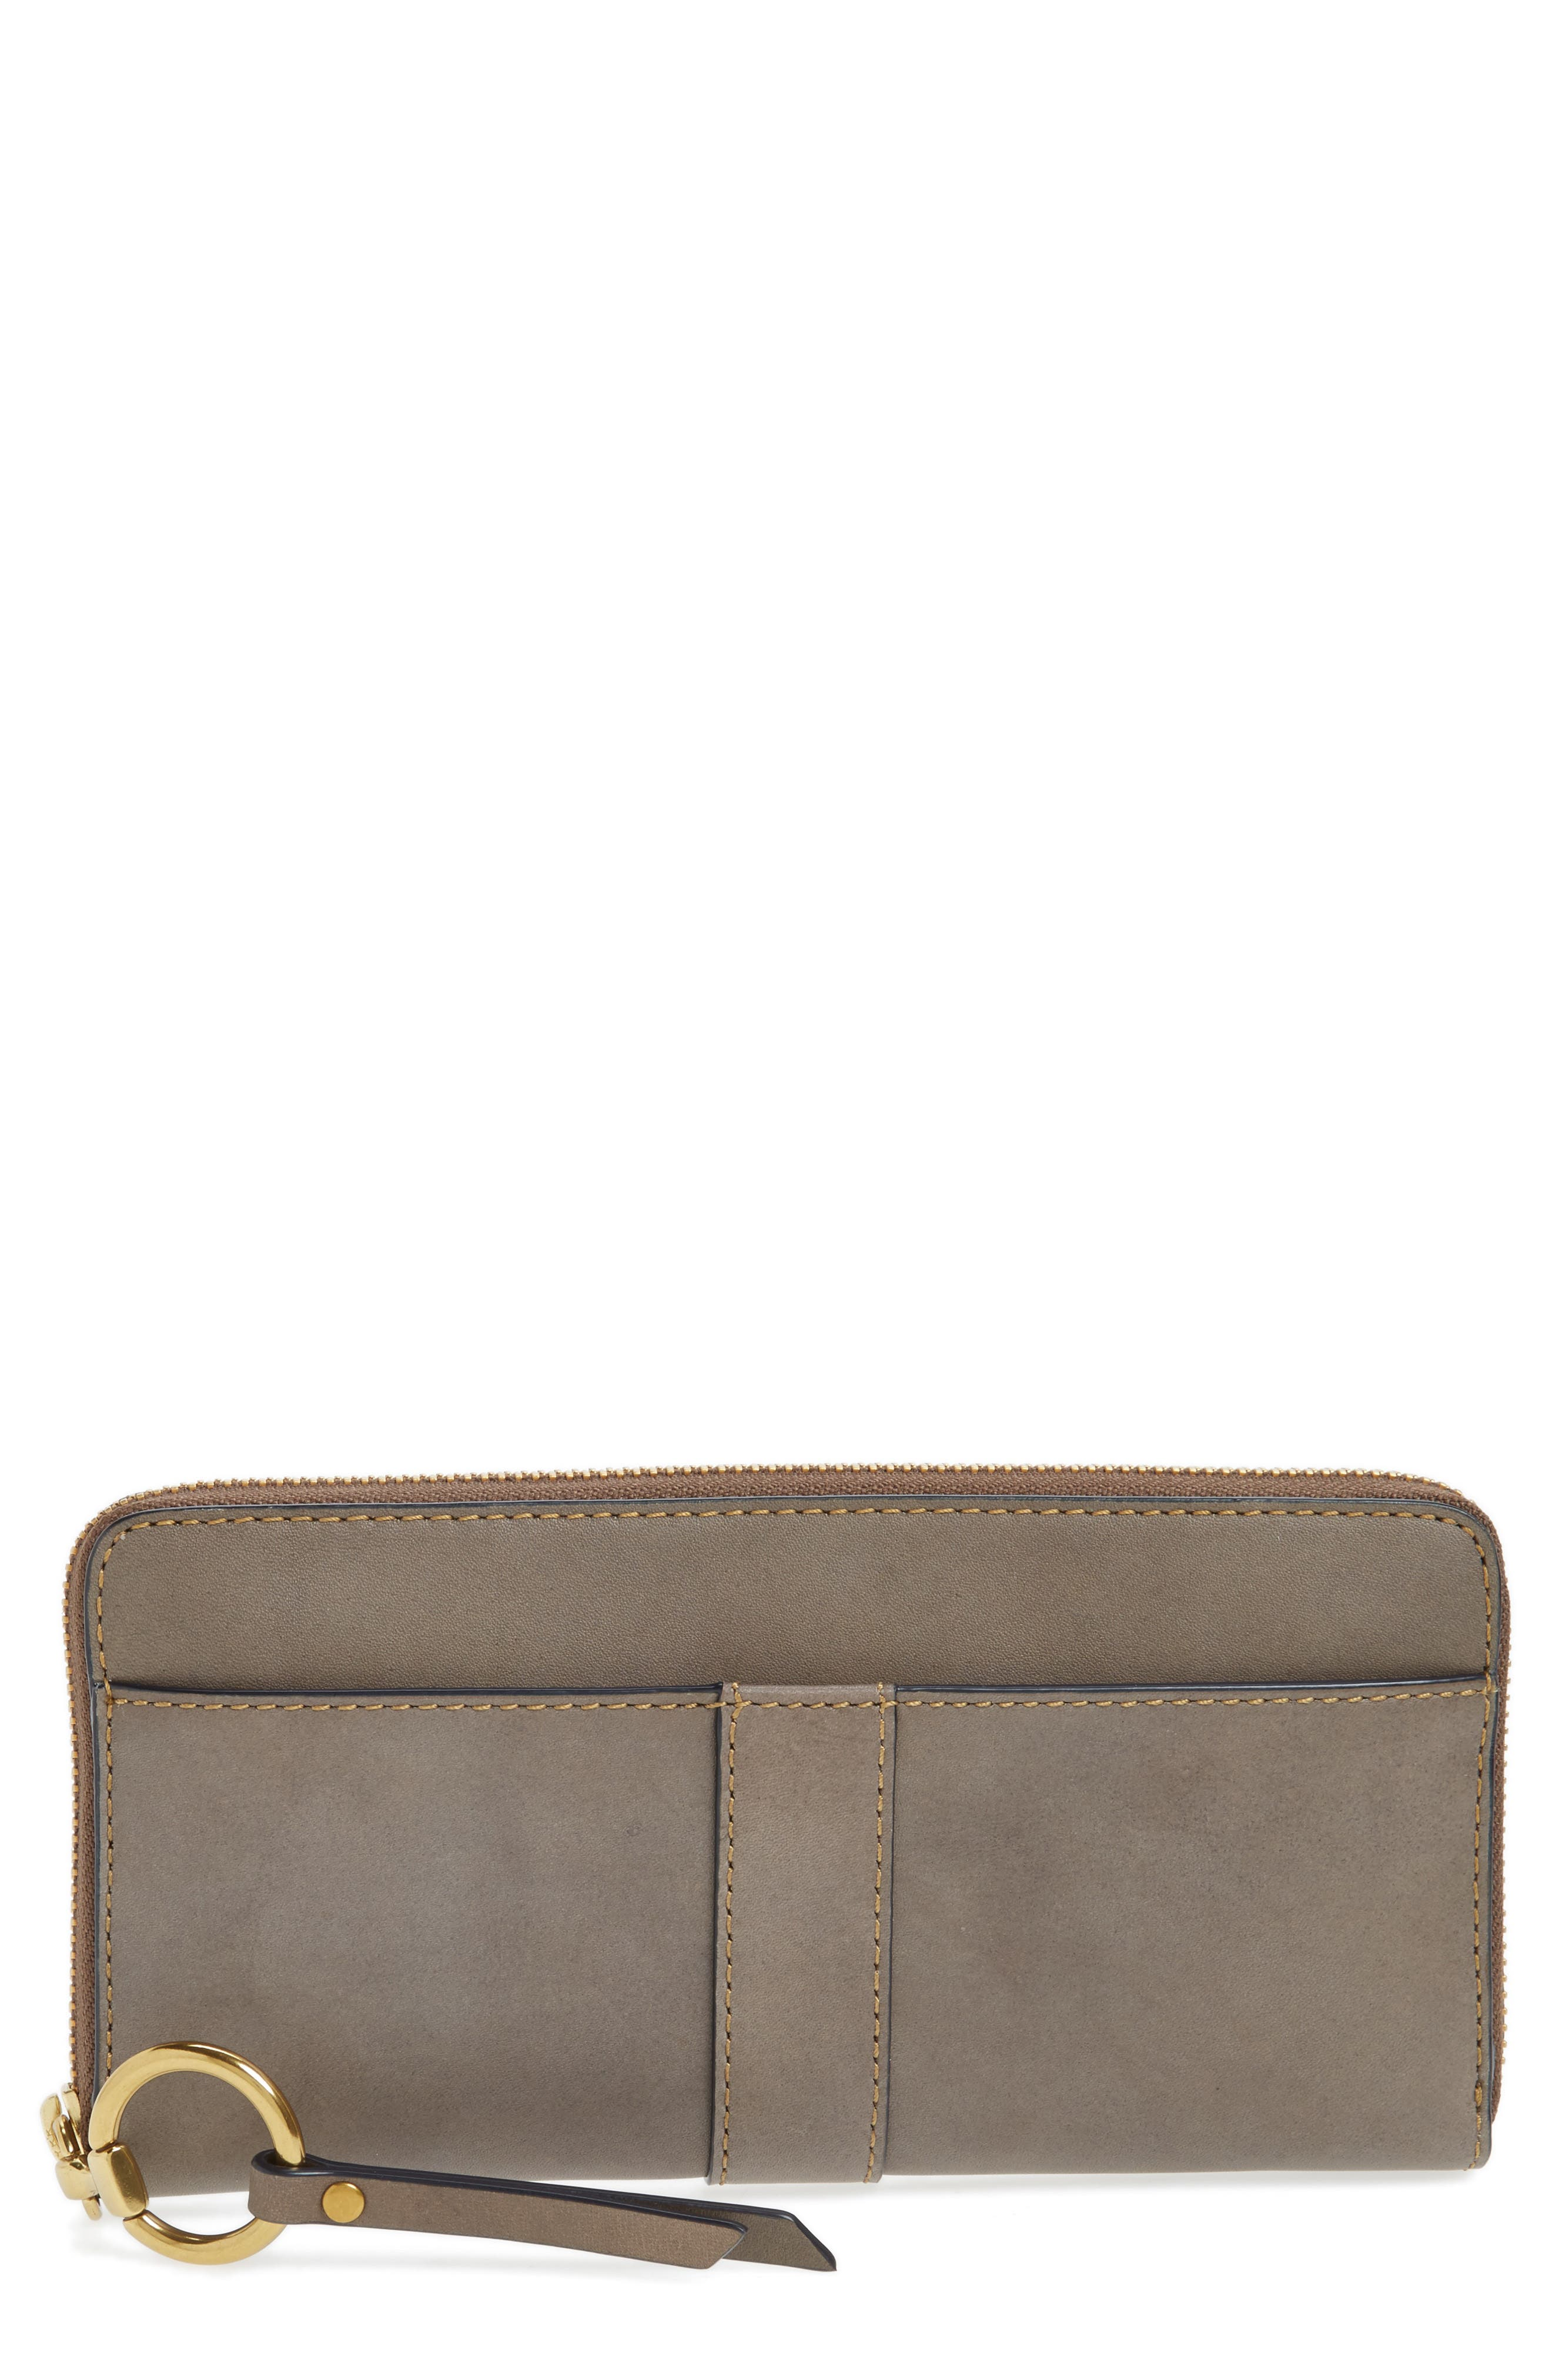 Alternate Image 1 Selected - Frye Ilana Harness Leather Zip Wallet